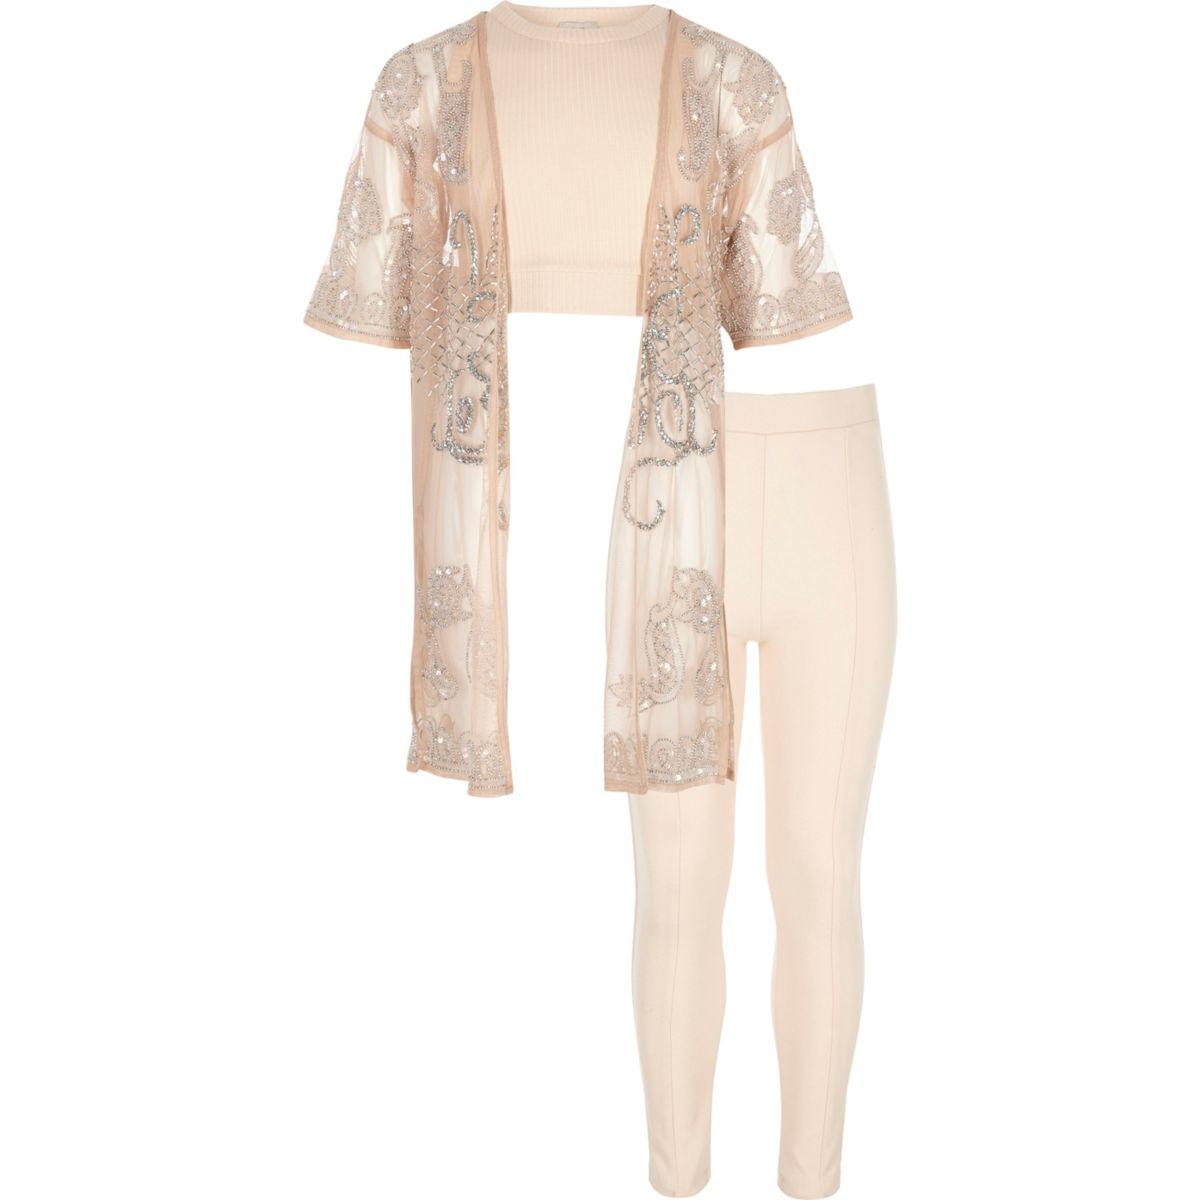 Girls Light Pink Embellished Kimono Outfit - Sets U0026 Outfits - Girls